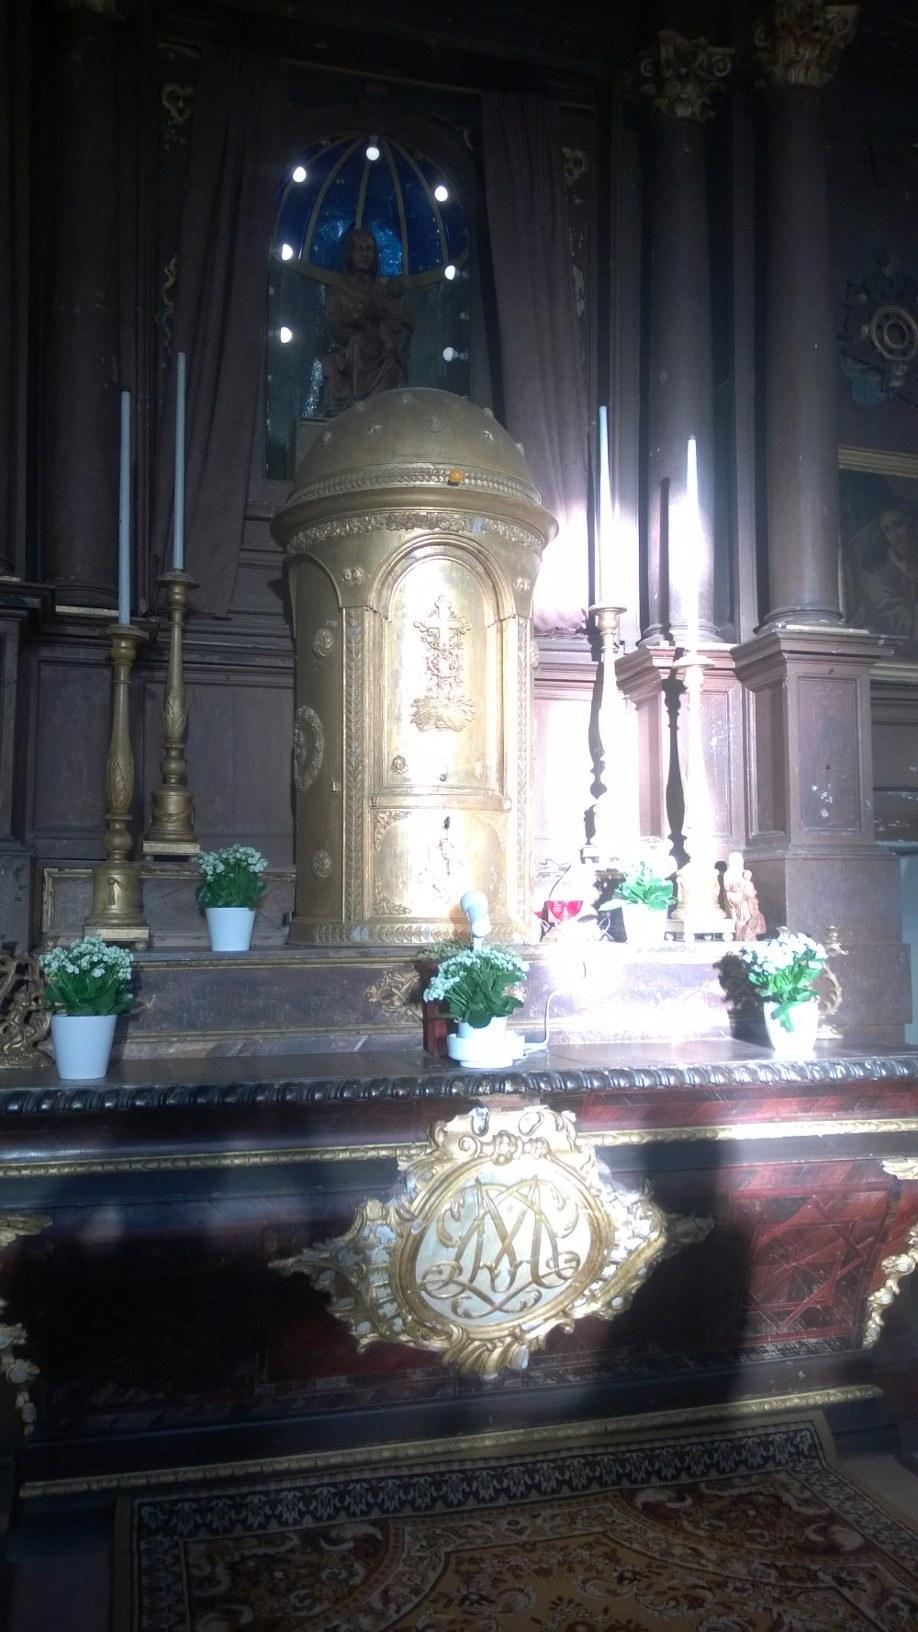 le Tabernacle 'illuminé'